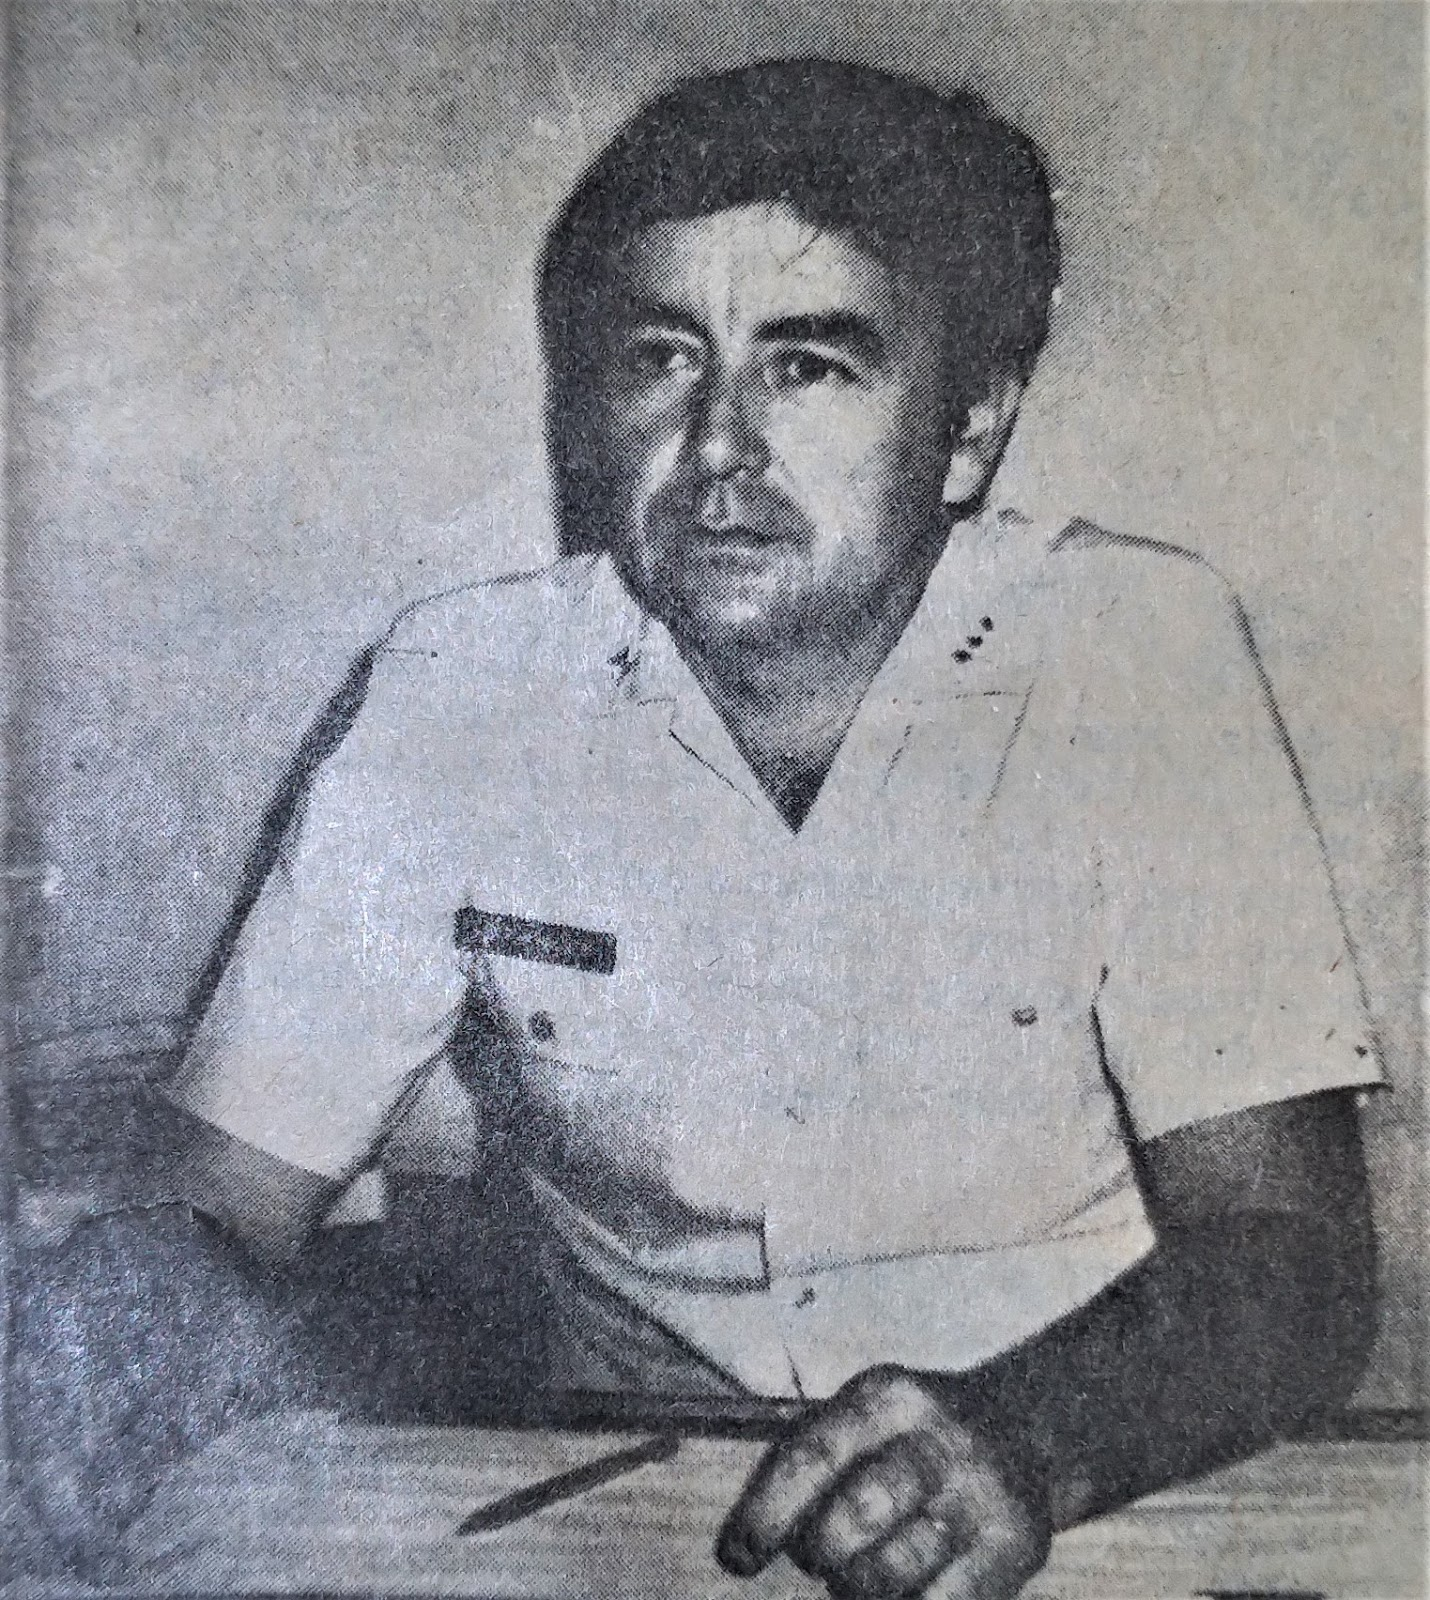 Antonio Tadeu Rodrigues promovido a Major - 1985